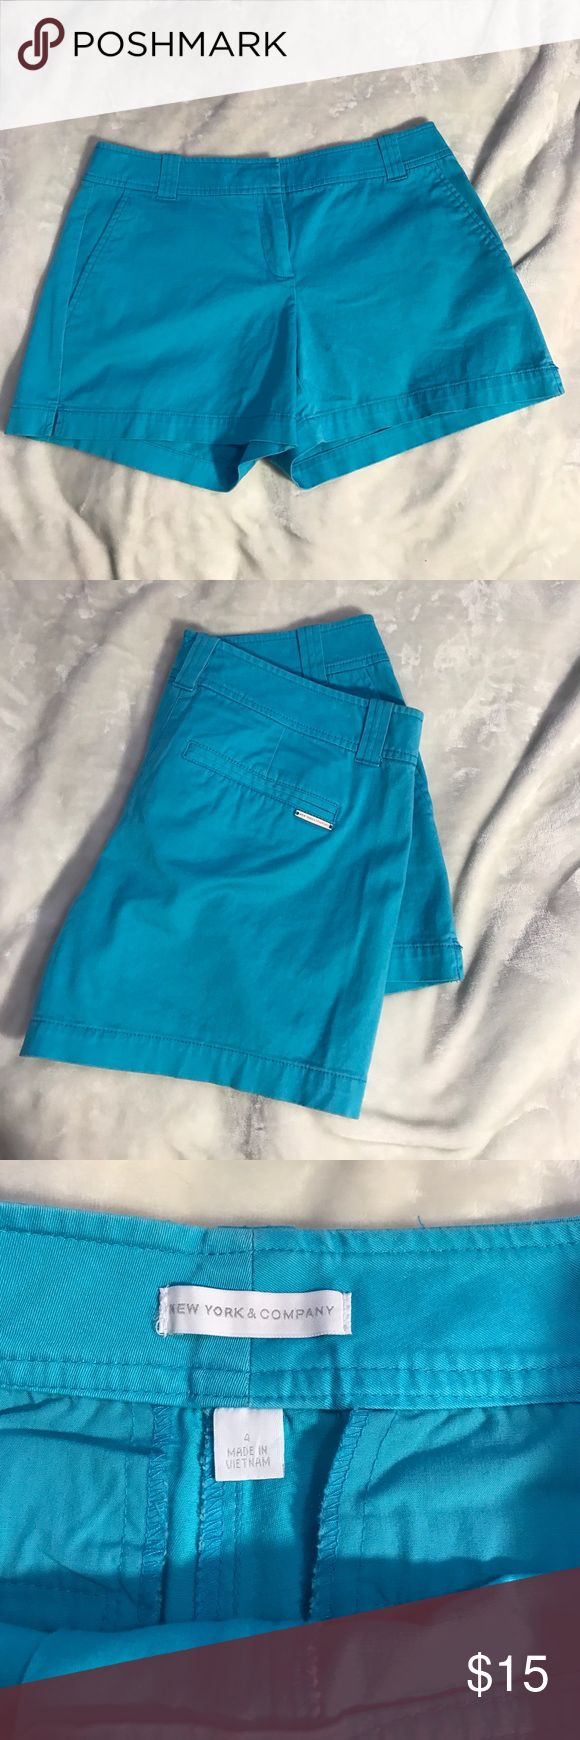 New York & Company blue khaki shorts Like new condition khaki shorts from New York and company. Perfect for spring and summer! New York & Company Shorts